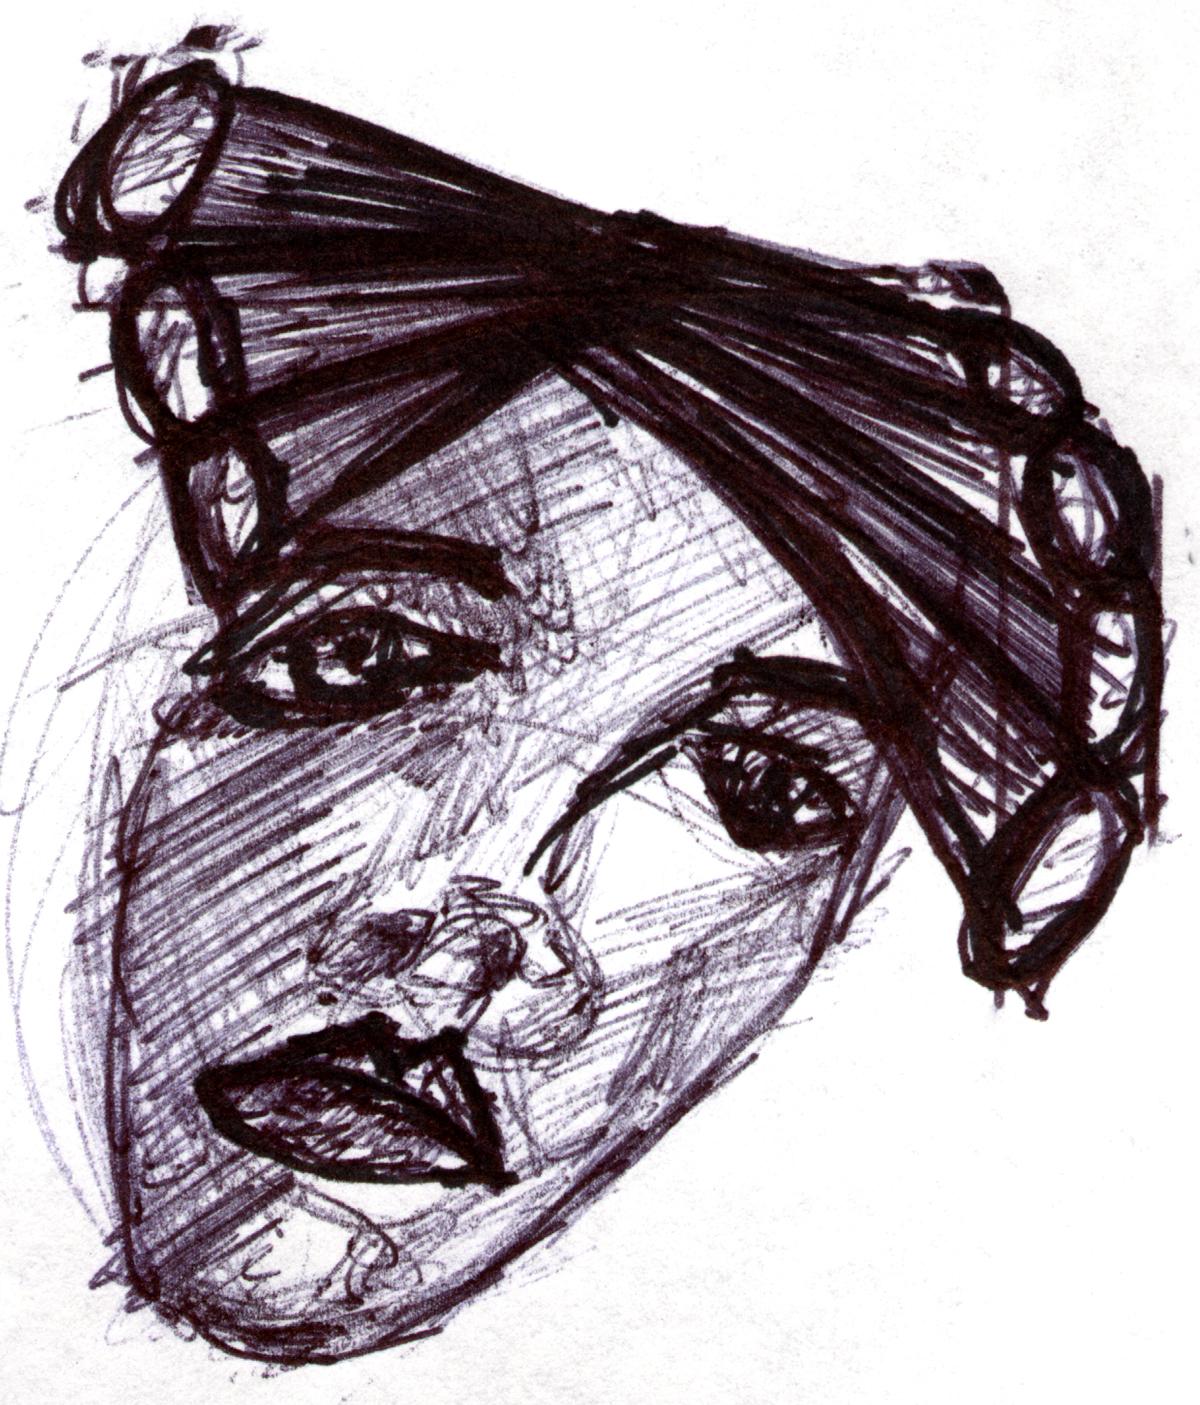 Drawing by Graphic Designer Gary Crossey